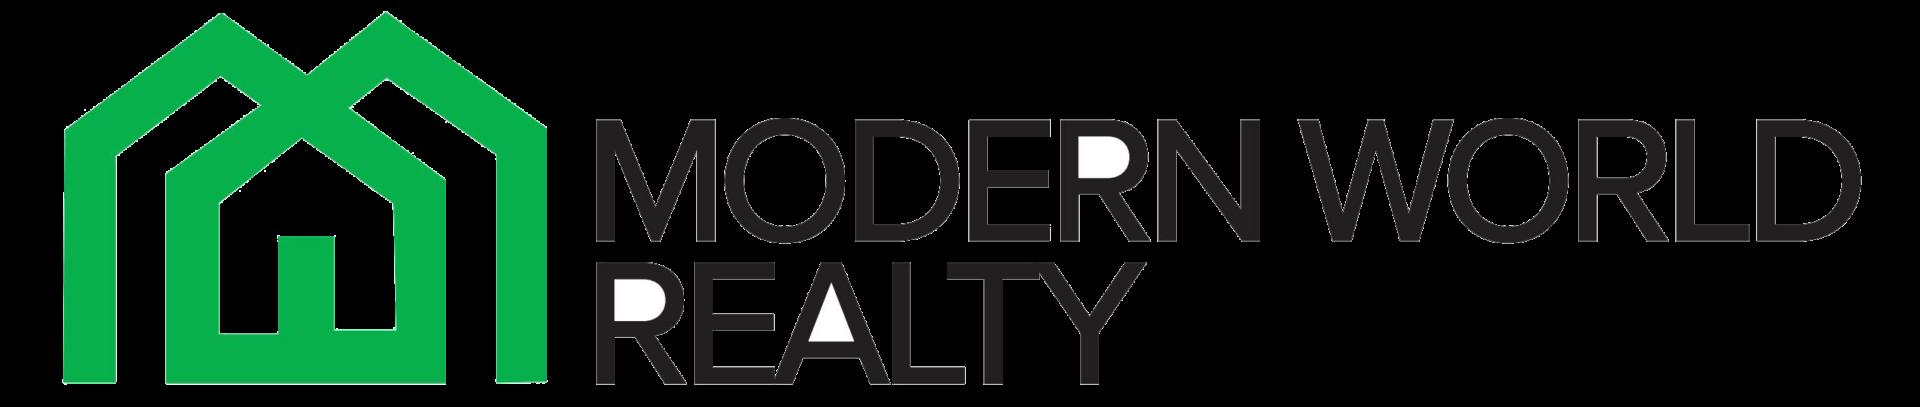 Modern World Realty logo